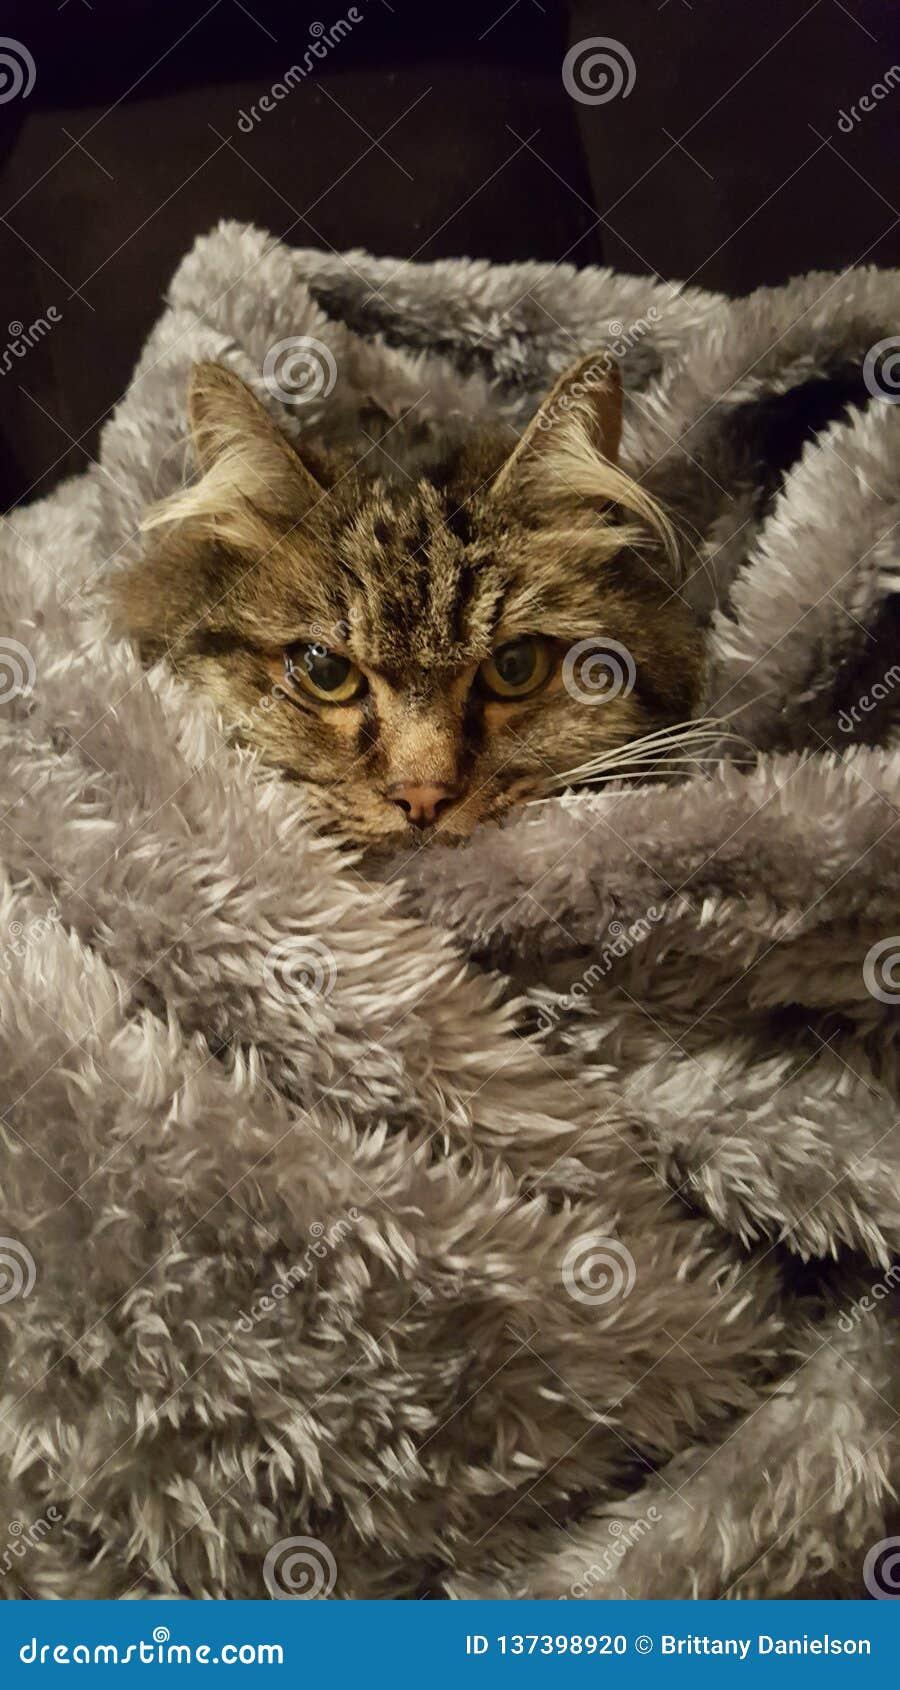 Snuggles the cat